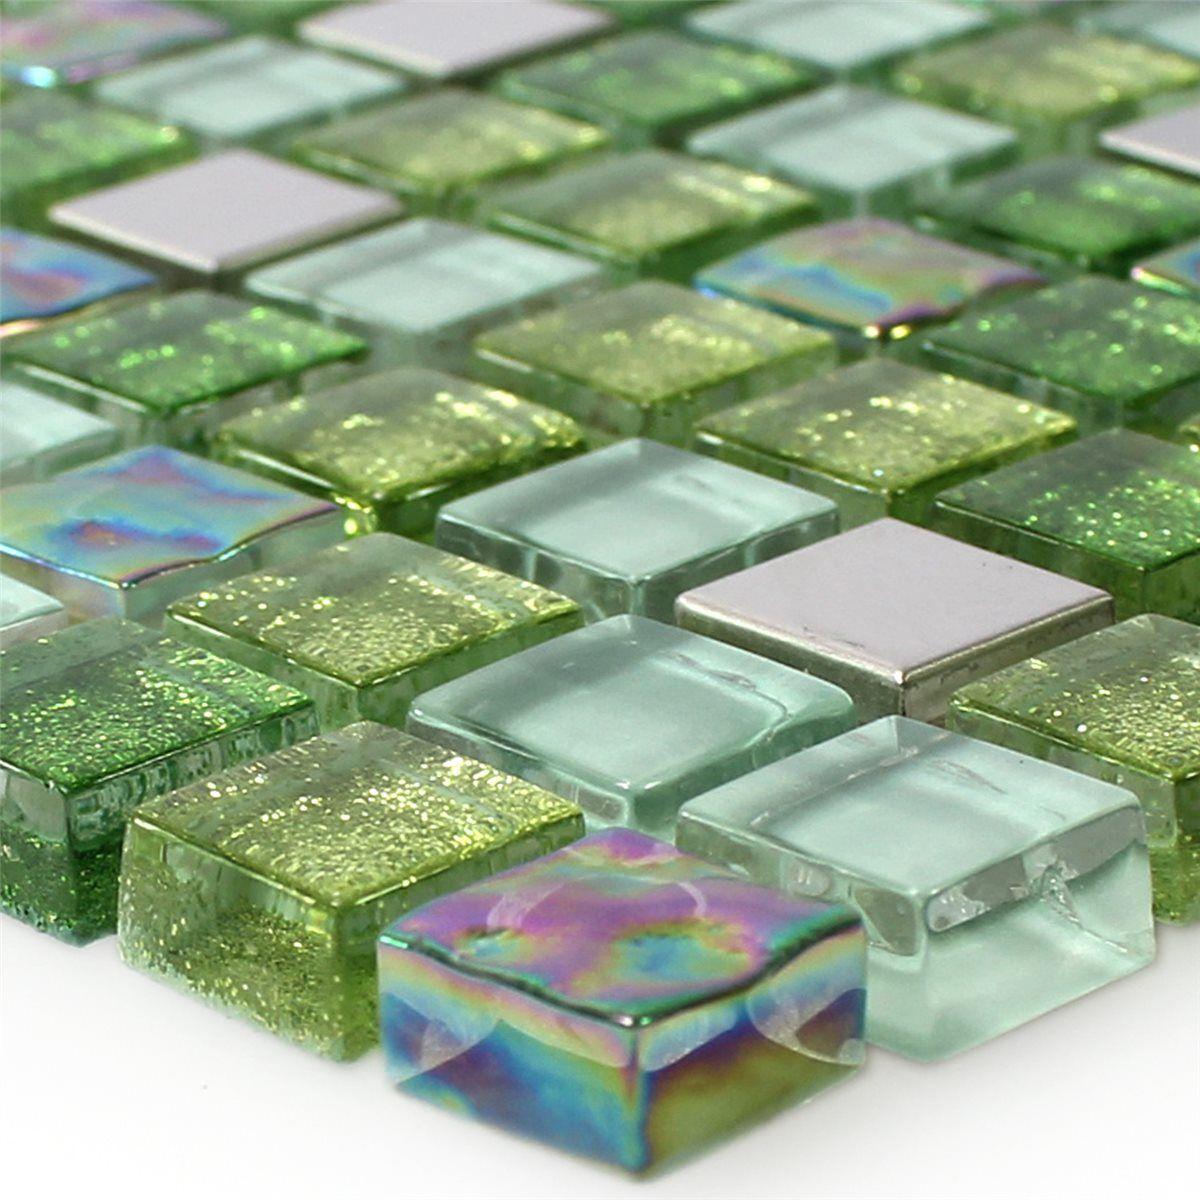 Glas Edelstahl Mosaik Fliesen Grün Mix BATH Pinterest Tile Art - Mosaik fliesen outlet